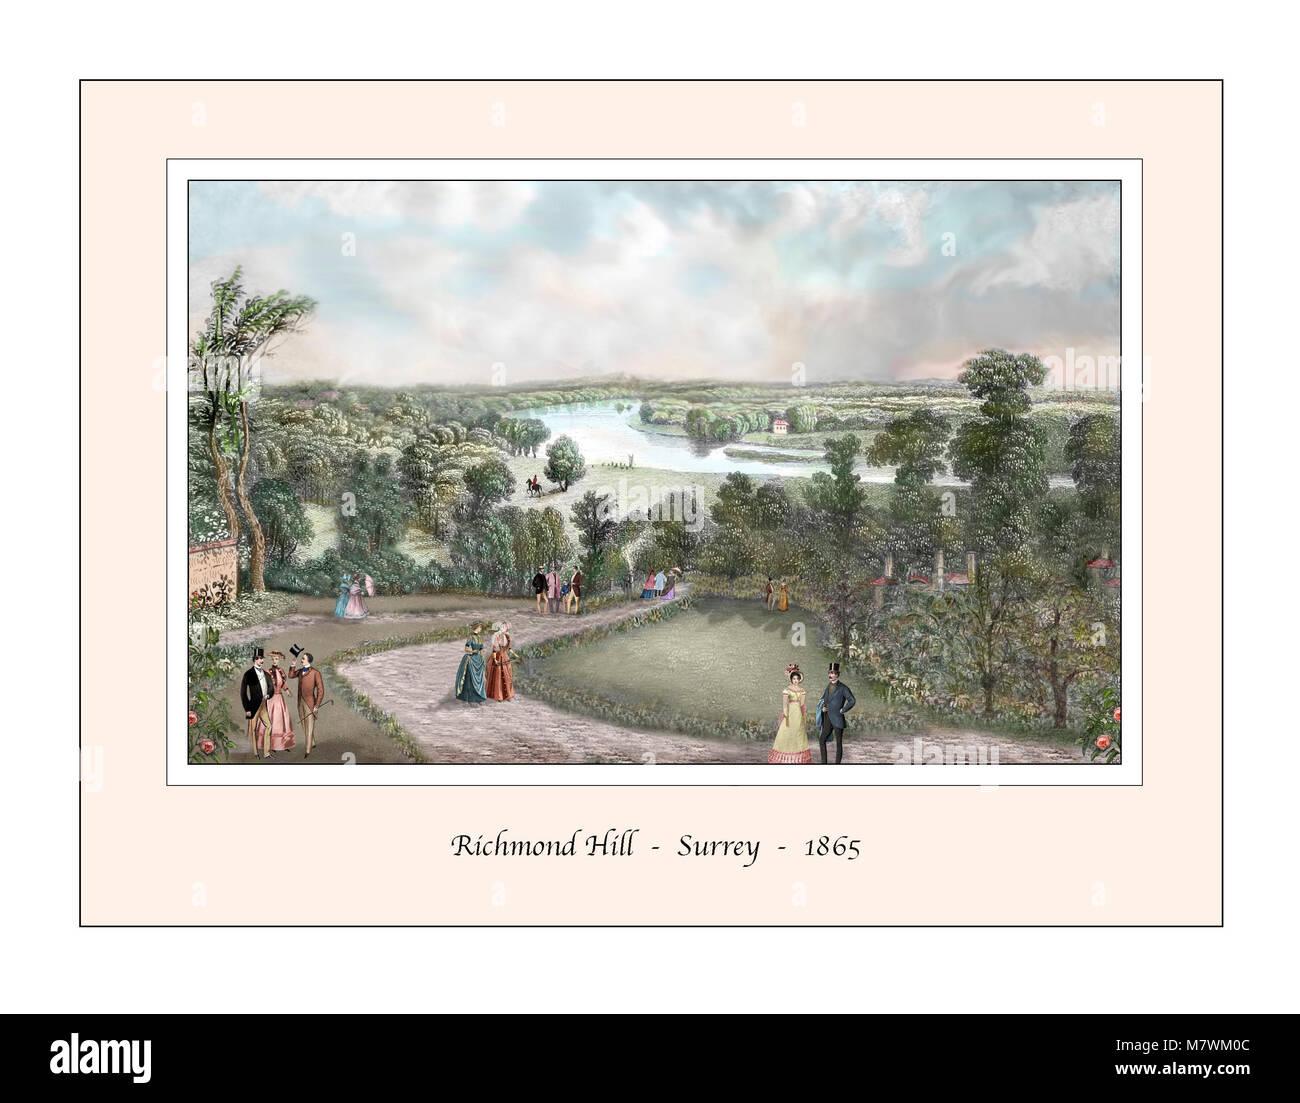 Richmond Hill Surrey Original Design based on a 19th century Engraving - Stock Image